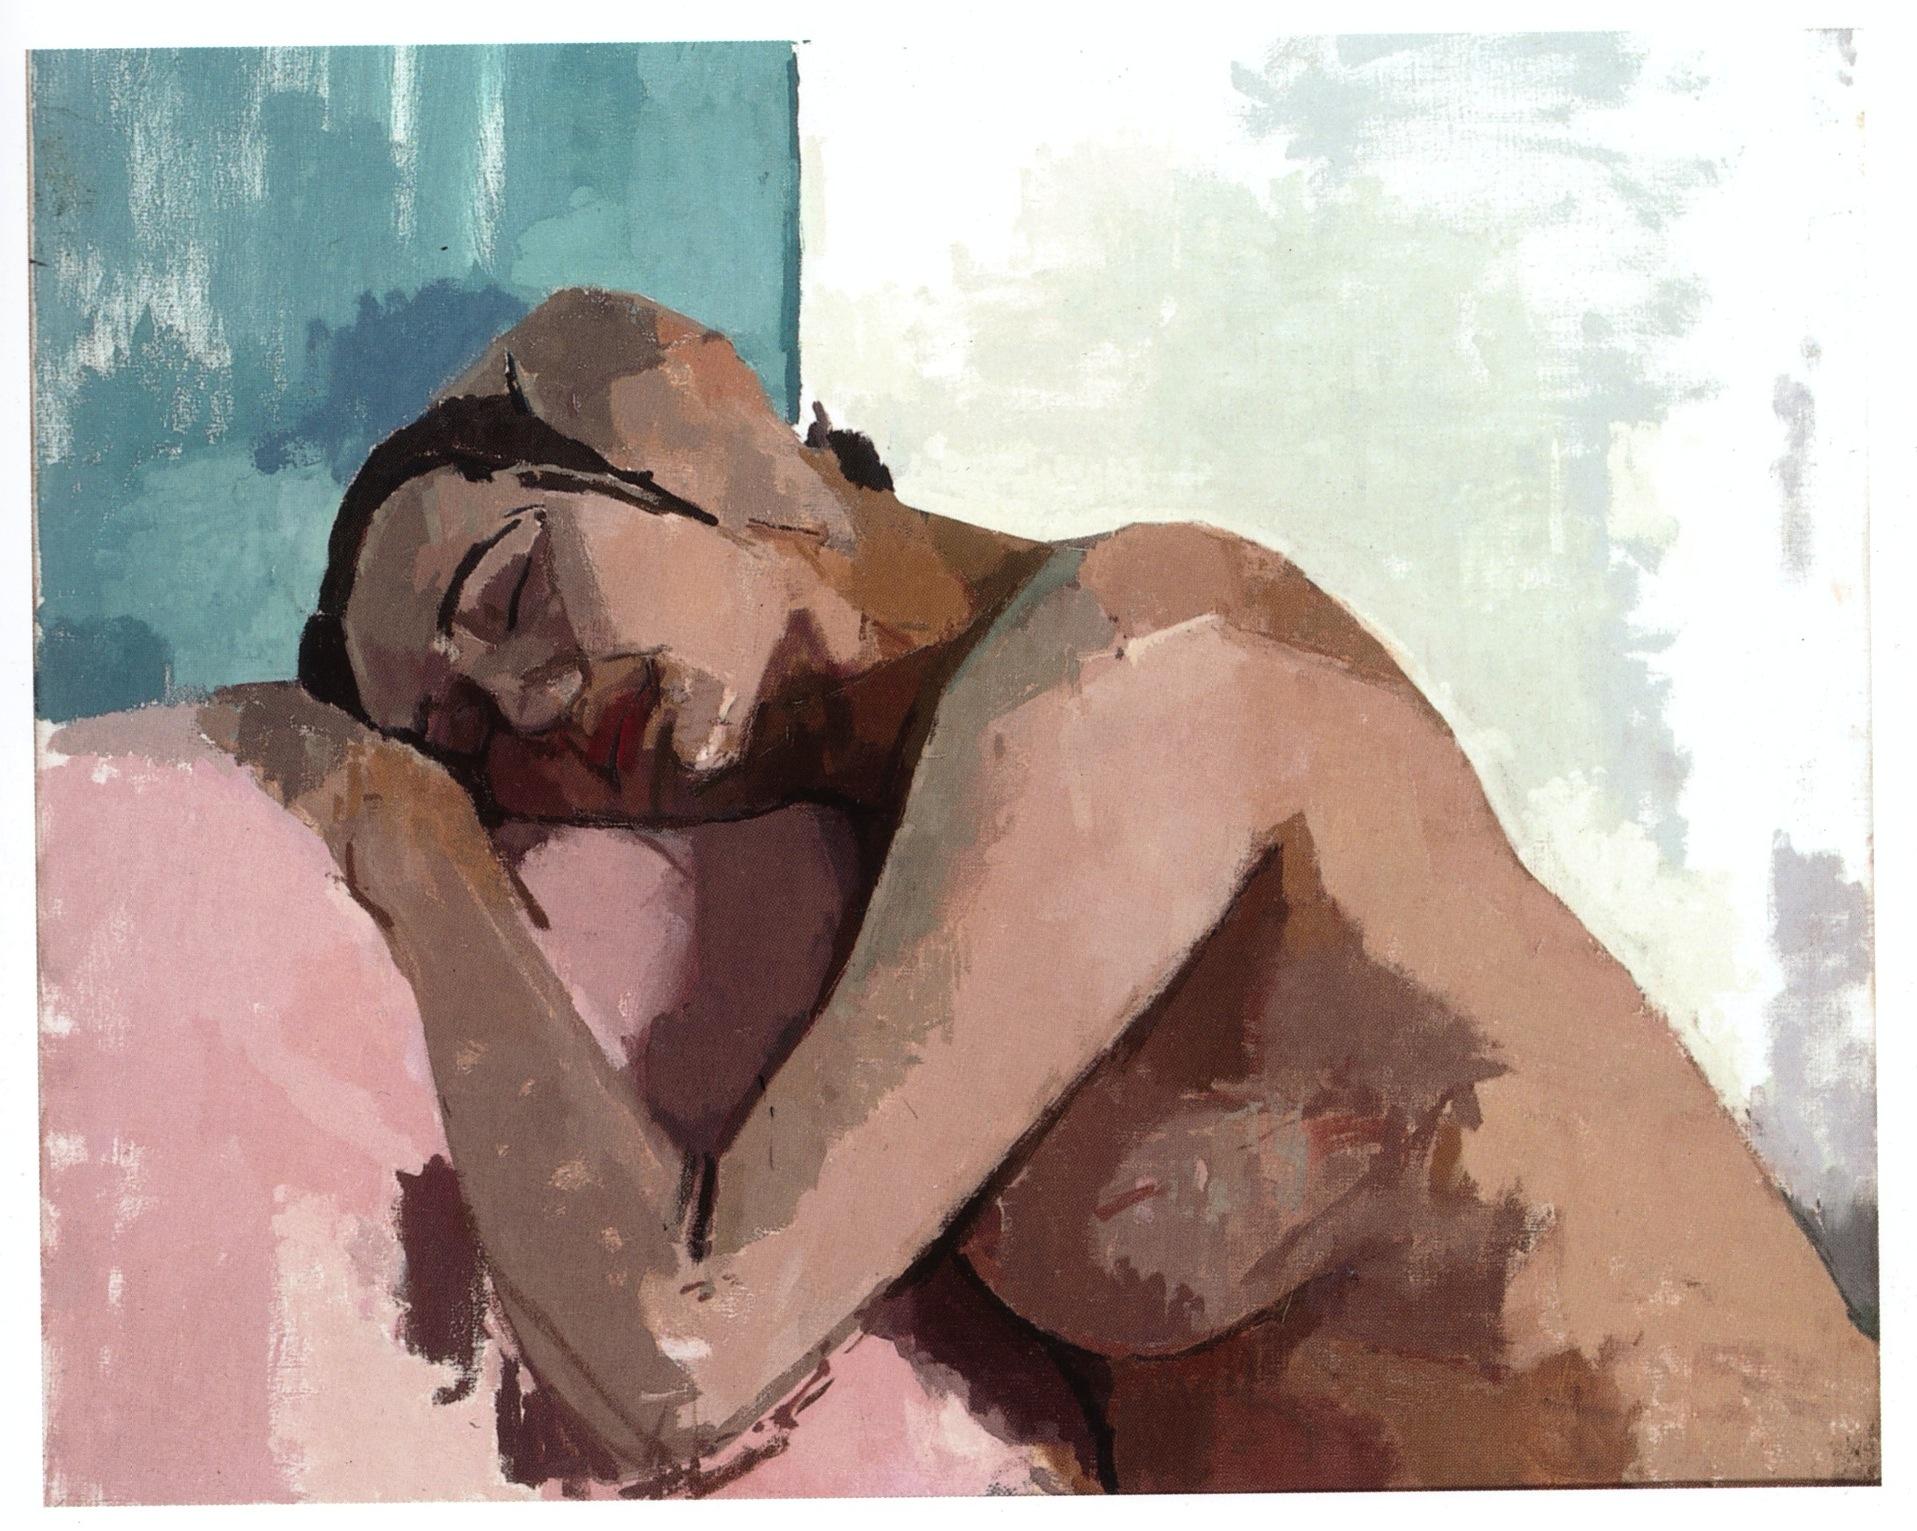 Sleeping Model, 1997